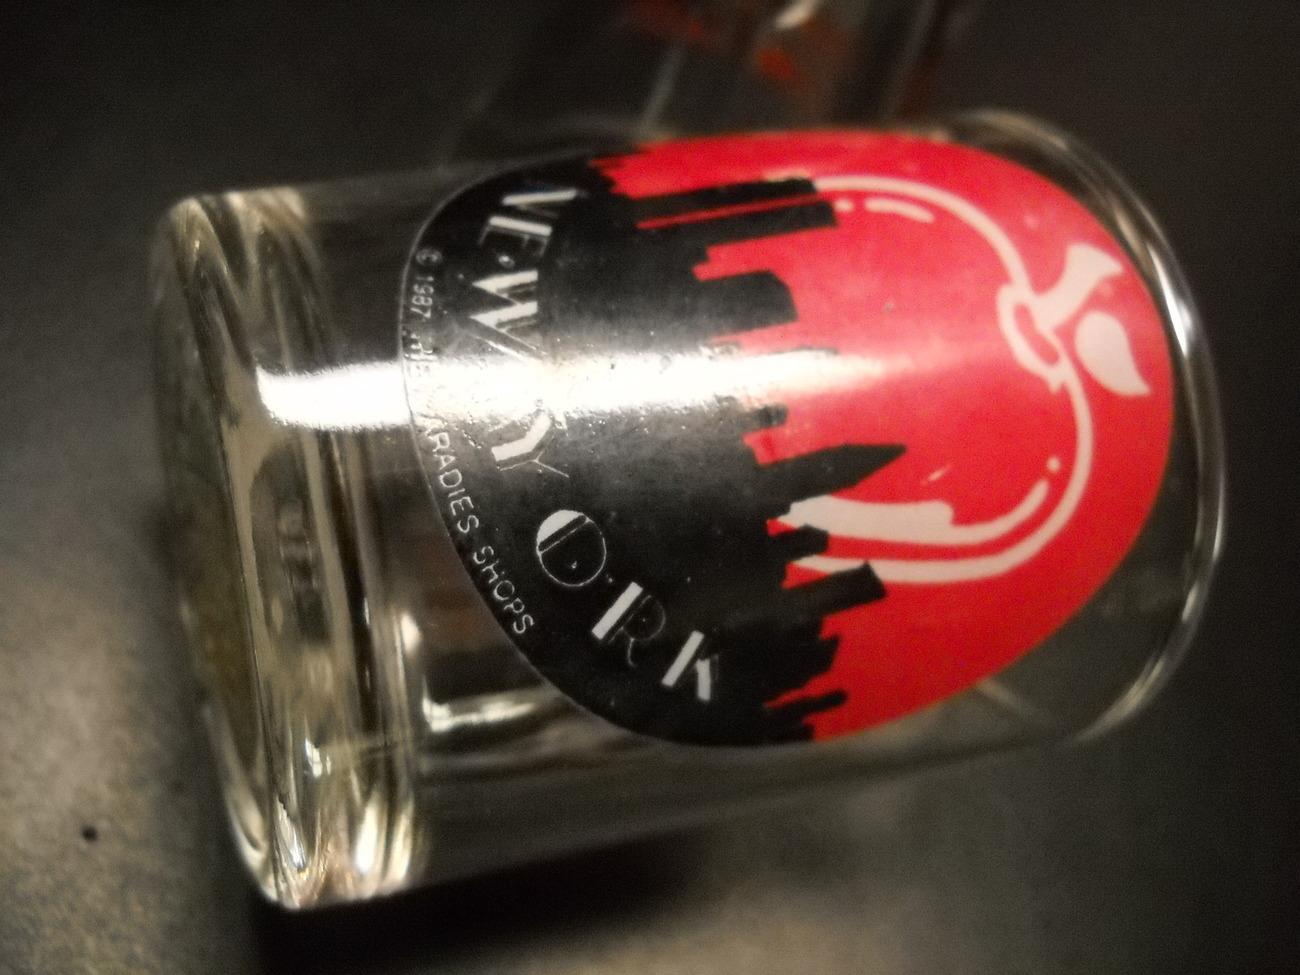 New York Candle Holder Shot Glass Big Apple Over Manhattan Skyline Red and Black